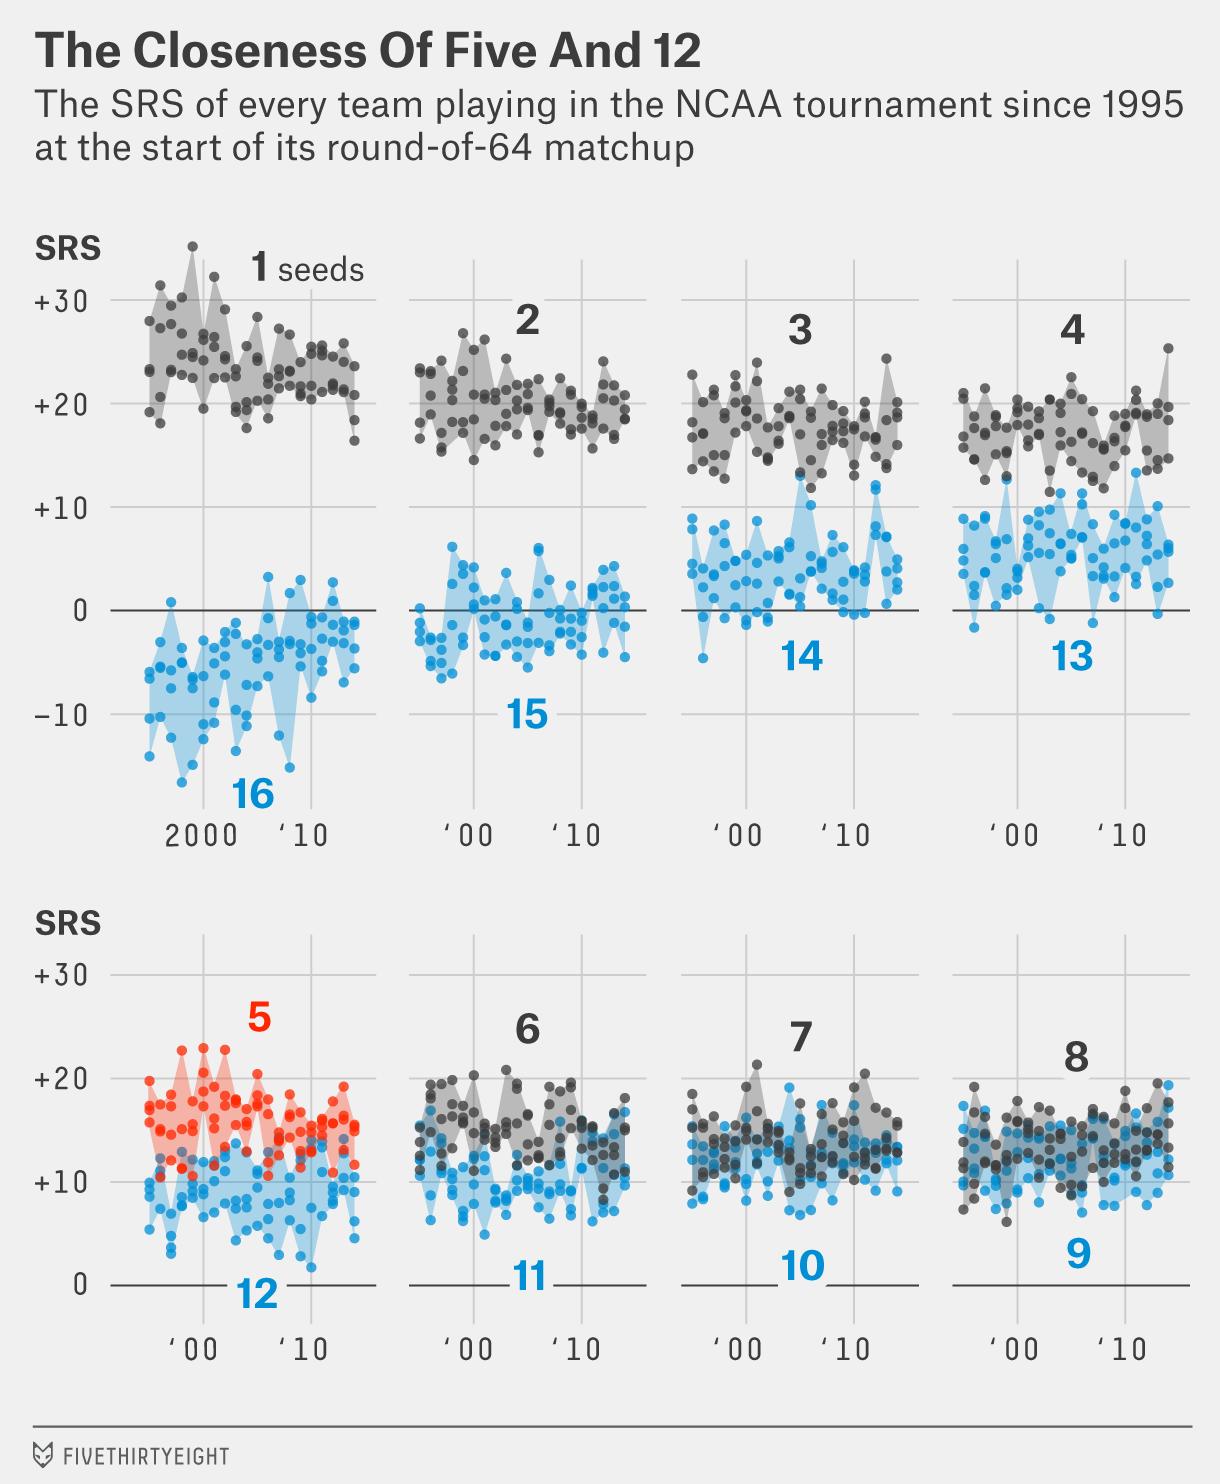 morris-seed-5-chart-2